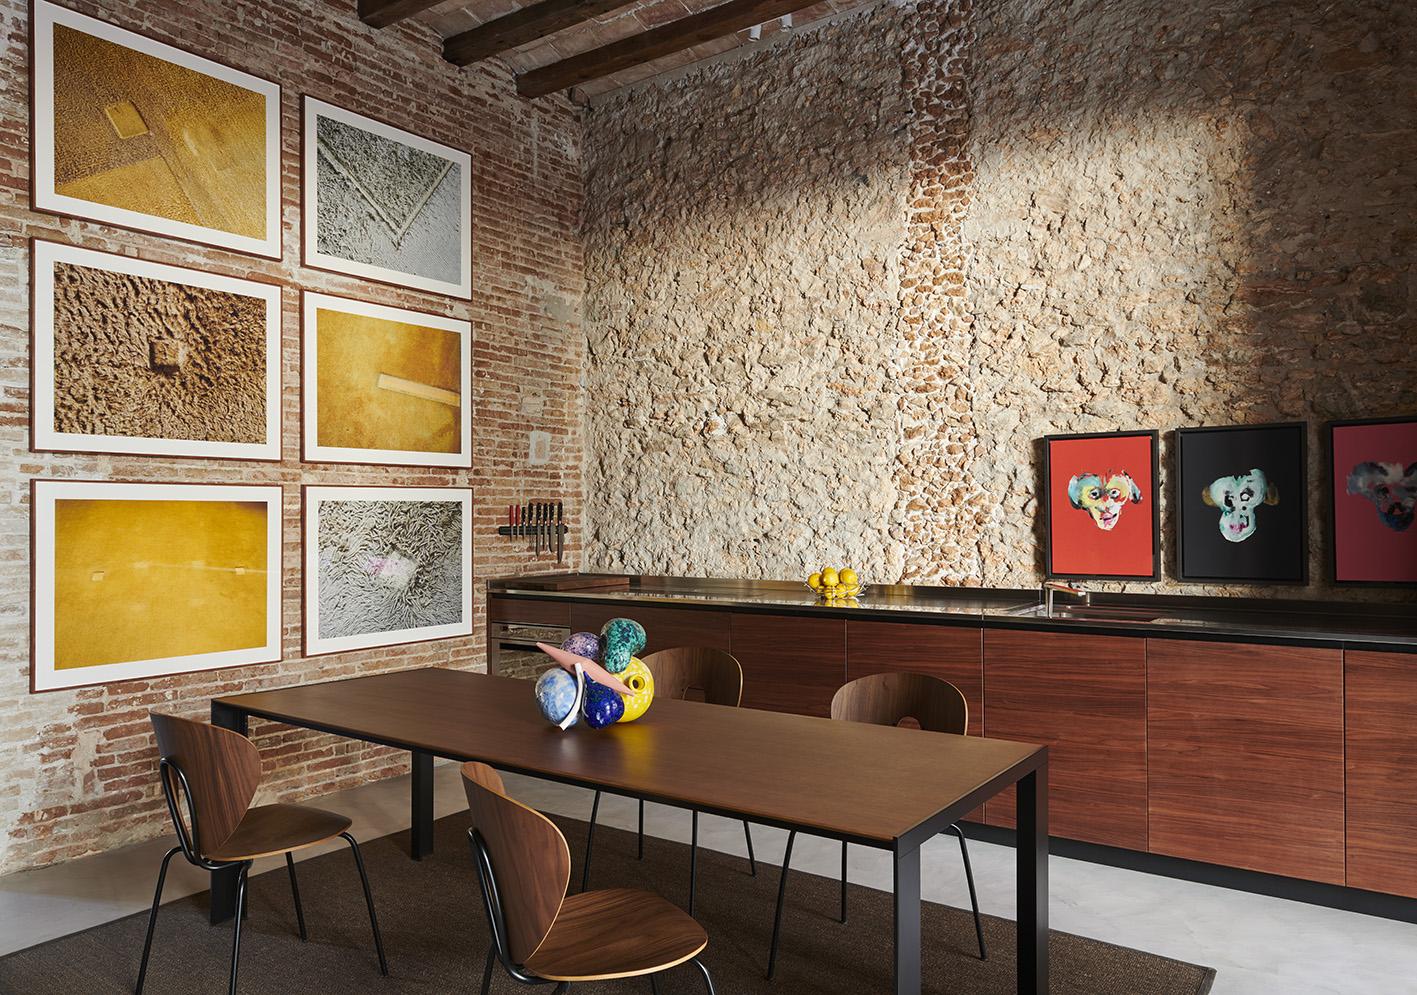 rardo-architects-sitges-barcelona-kitchen-ii